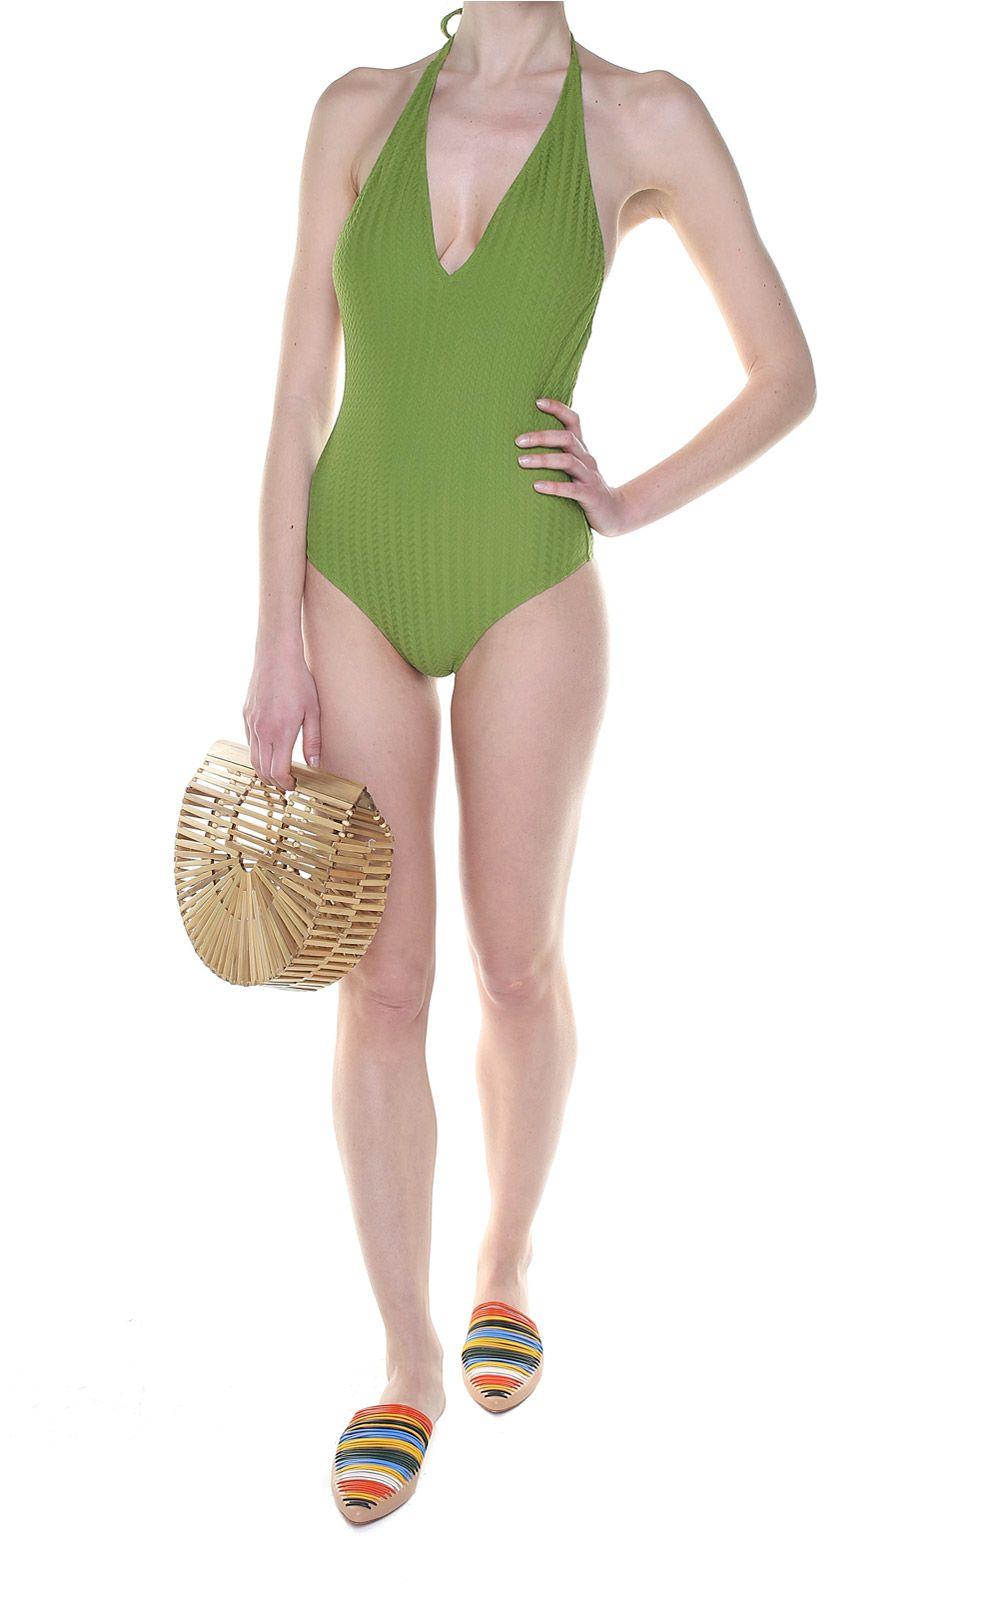 Clearance Enjoy Buy Cheap Many Kinds Of Mia fishbone swimsuit Mimì à la Mer Professional For Sale pgATbnS5T